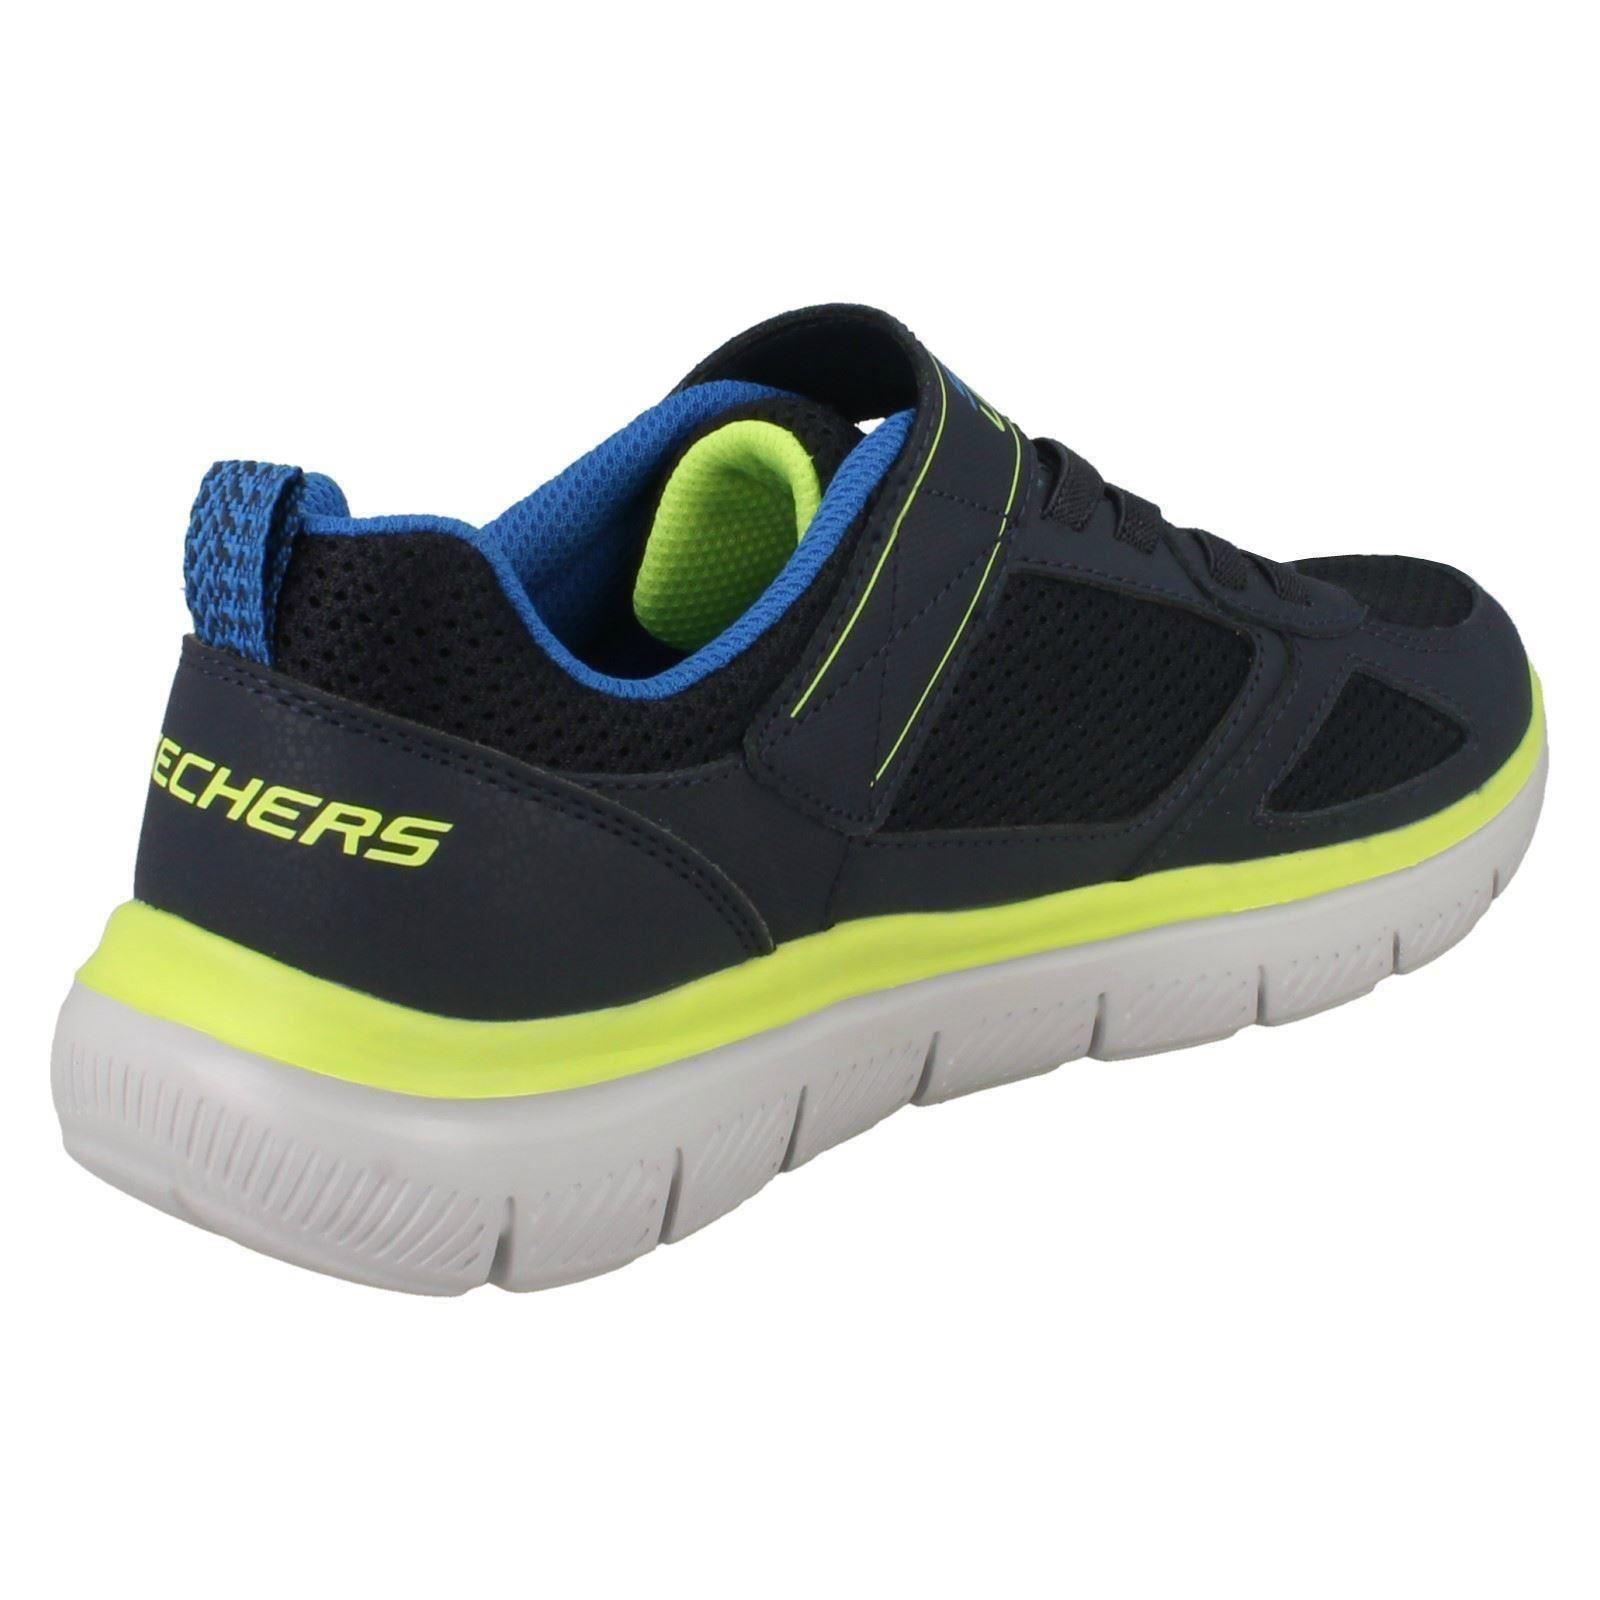 Bleu légères pour Shot 97451' garçons Skechers marine Baskets 'power 04wUqd4g